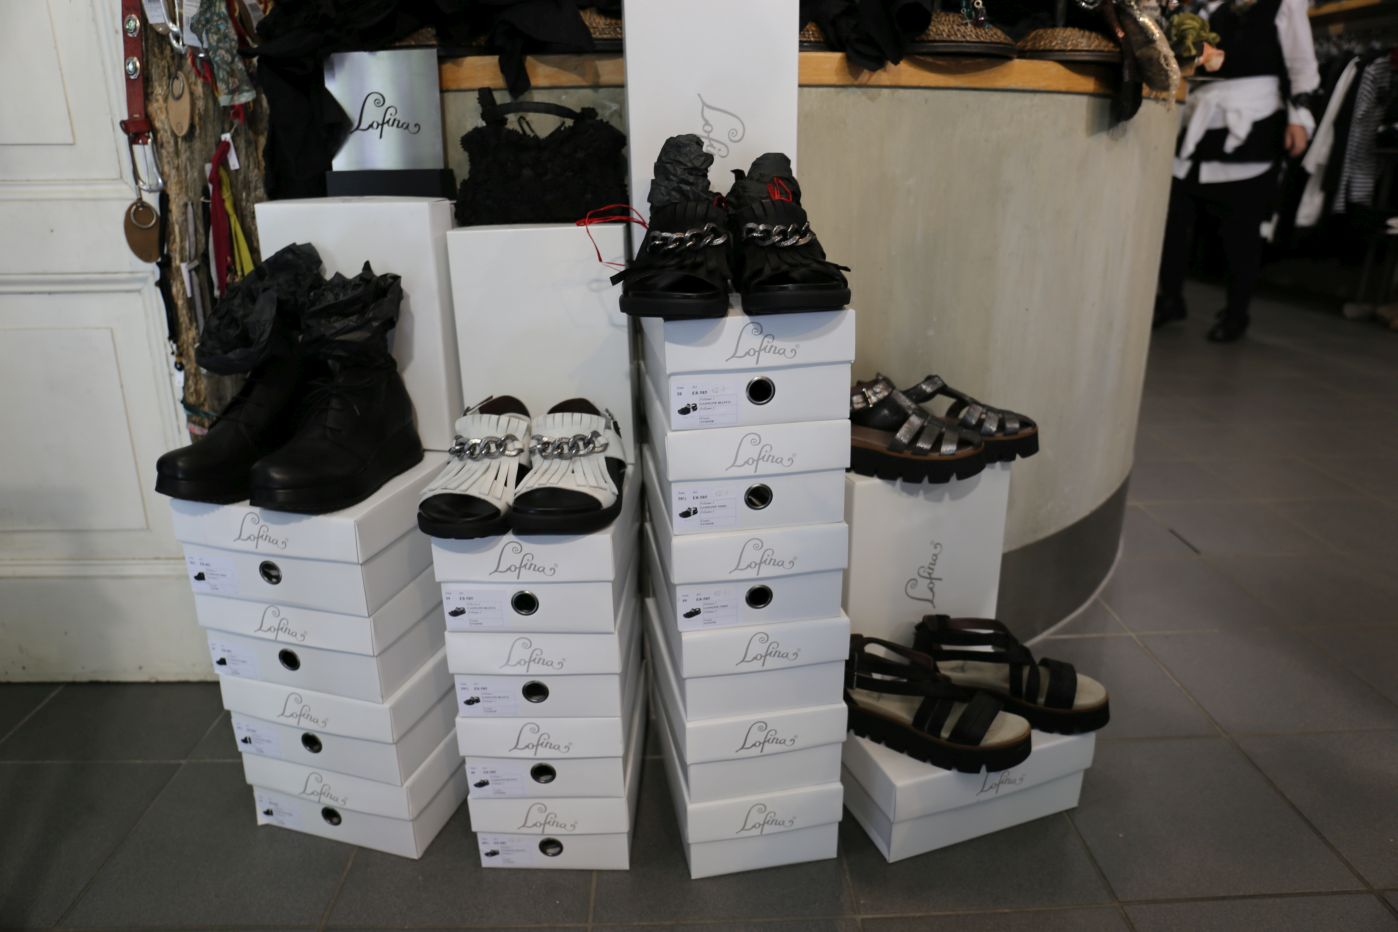 Doering boutique(12)